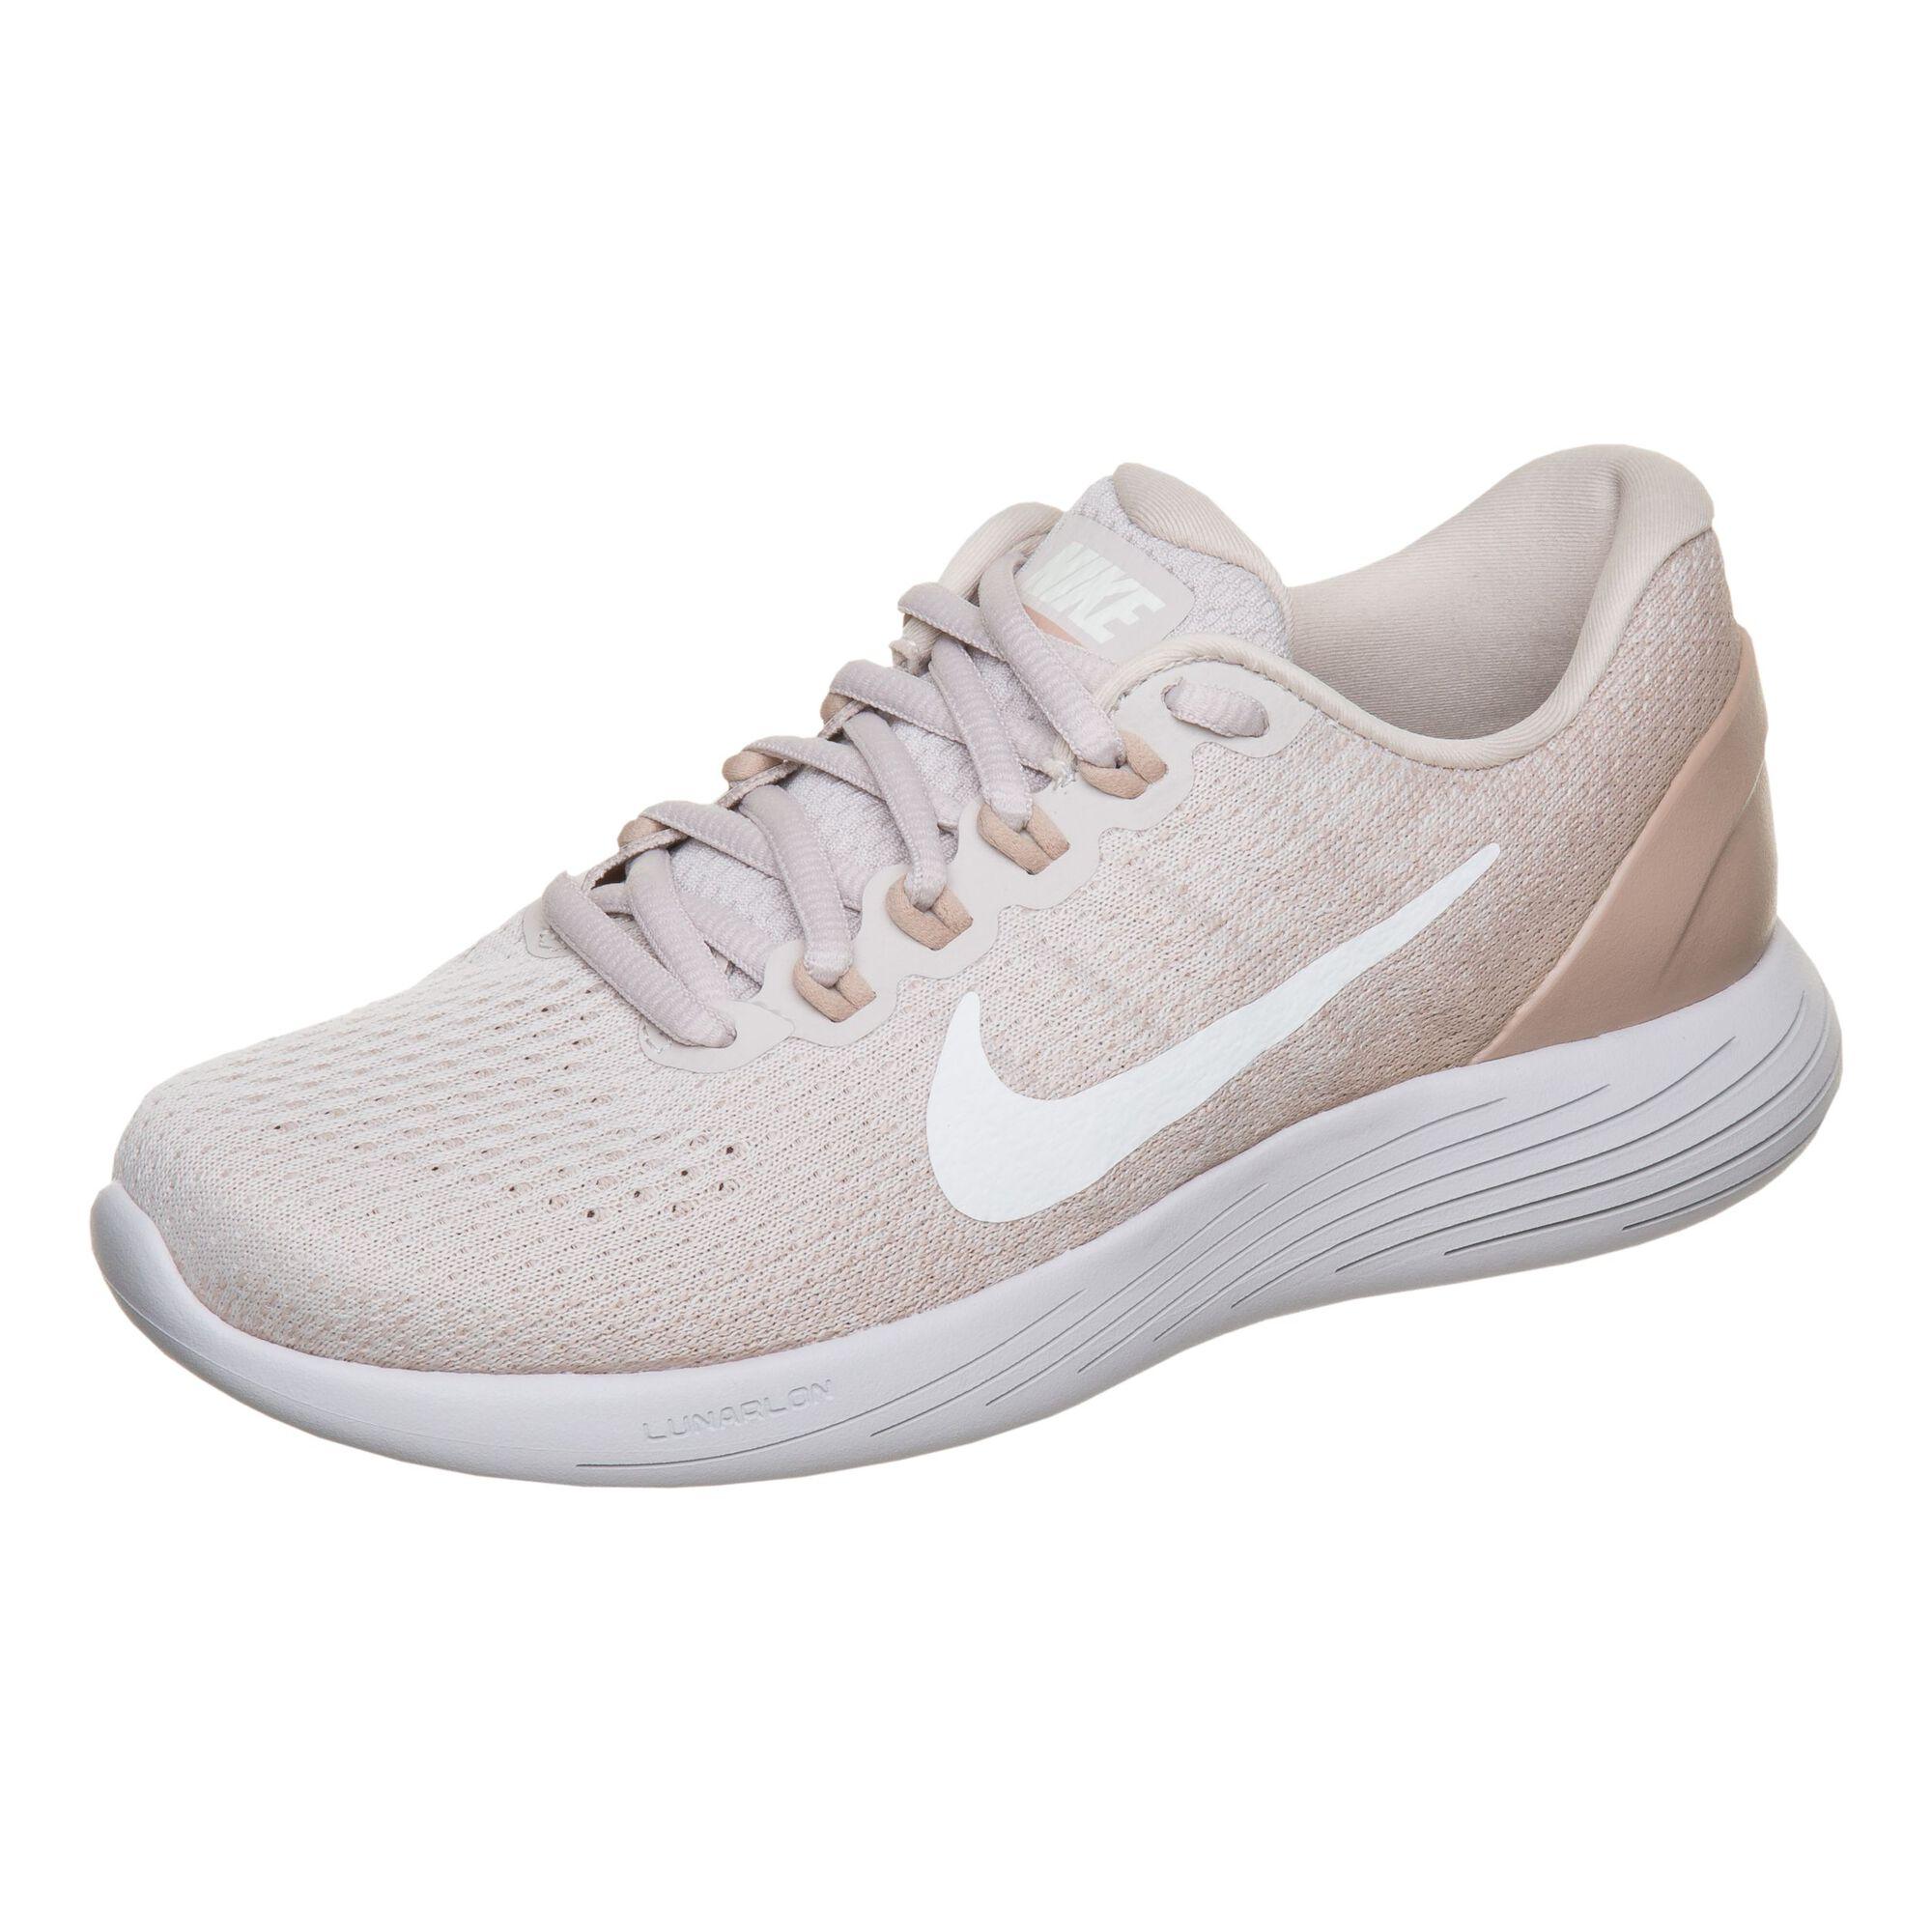 e5f5468dd36aa buy Nike LunarGlide 9 Stability Running Shoe Women - Pink